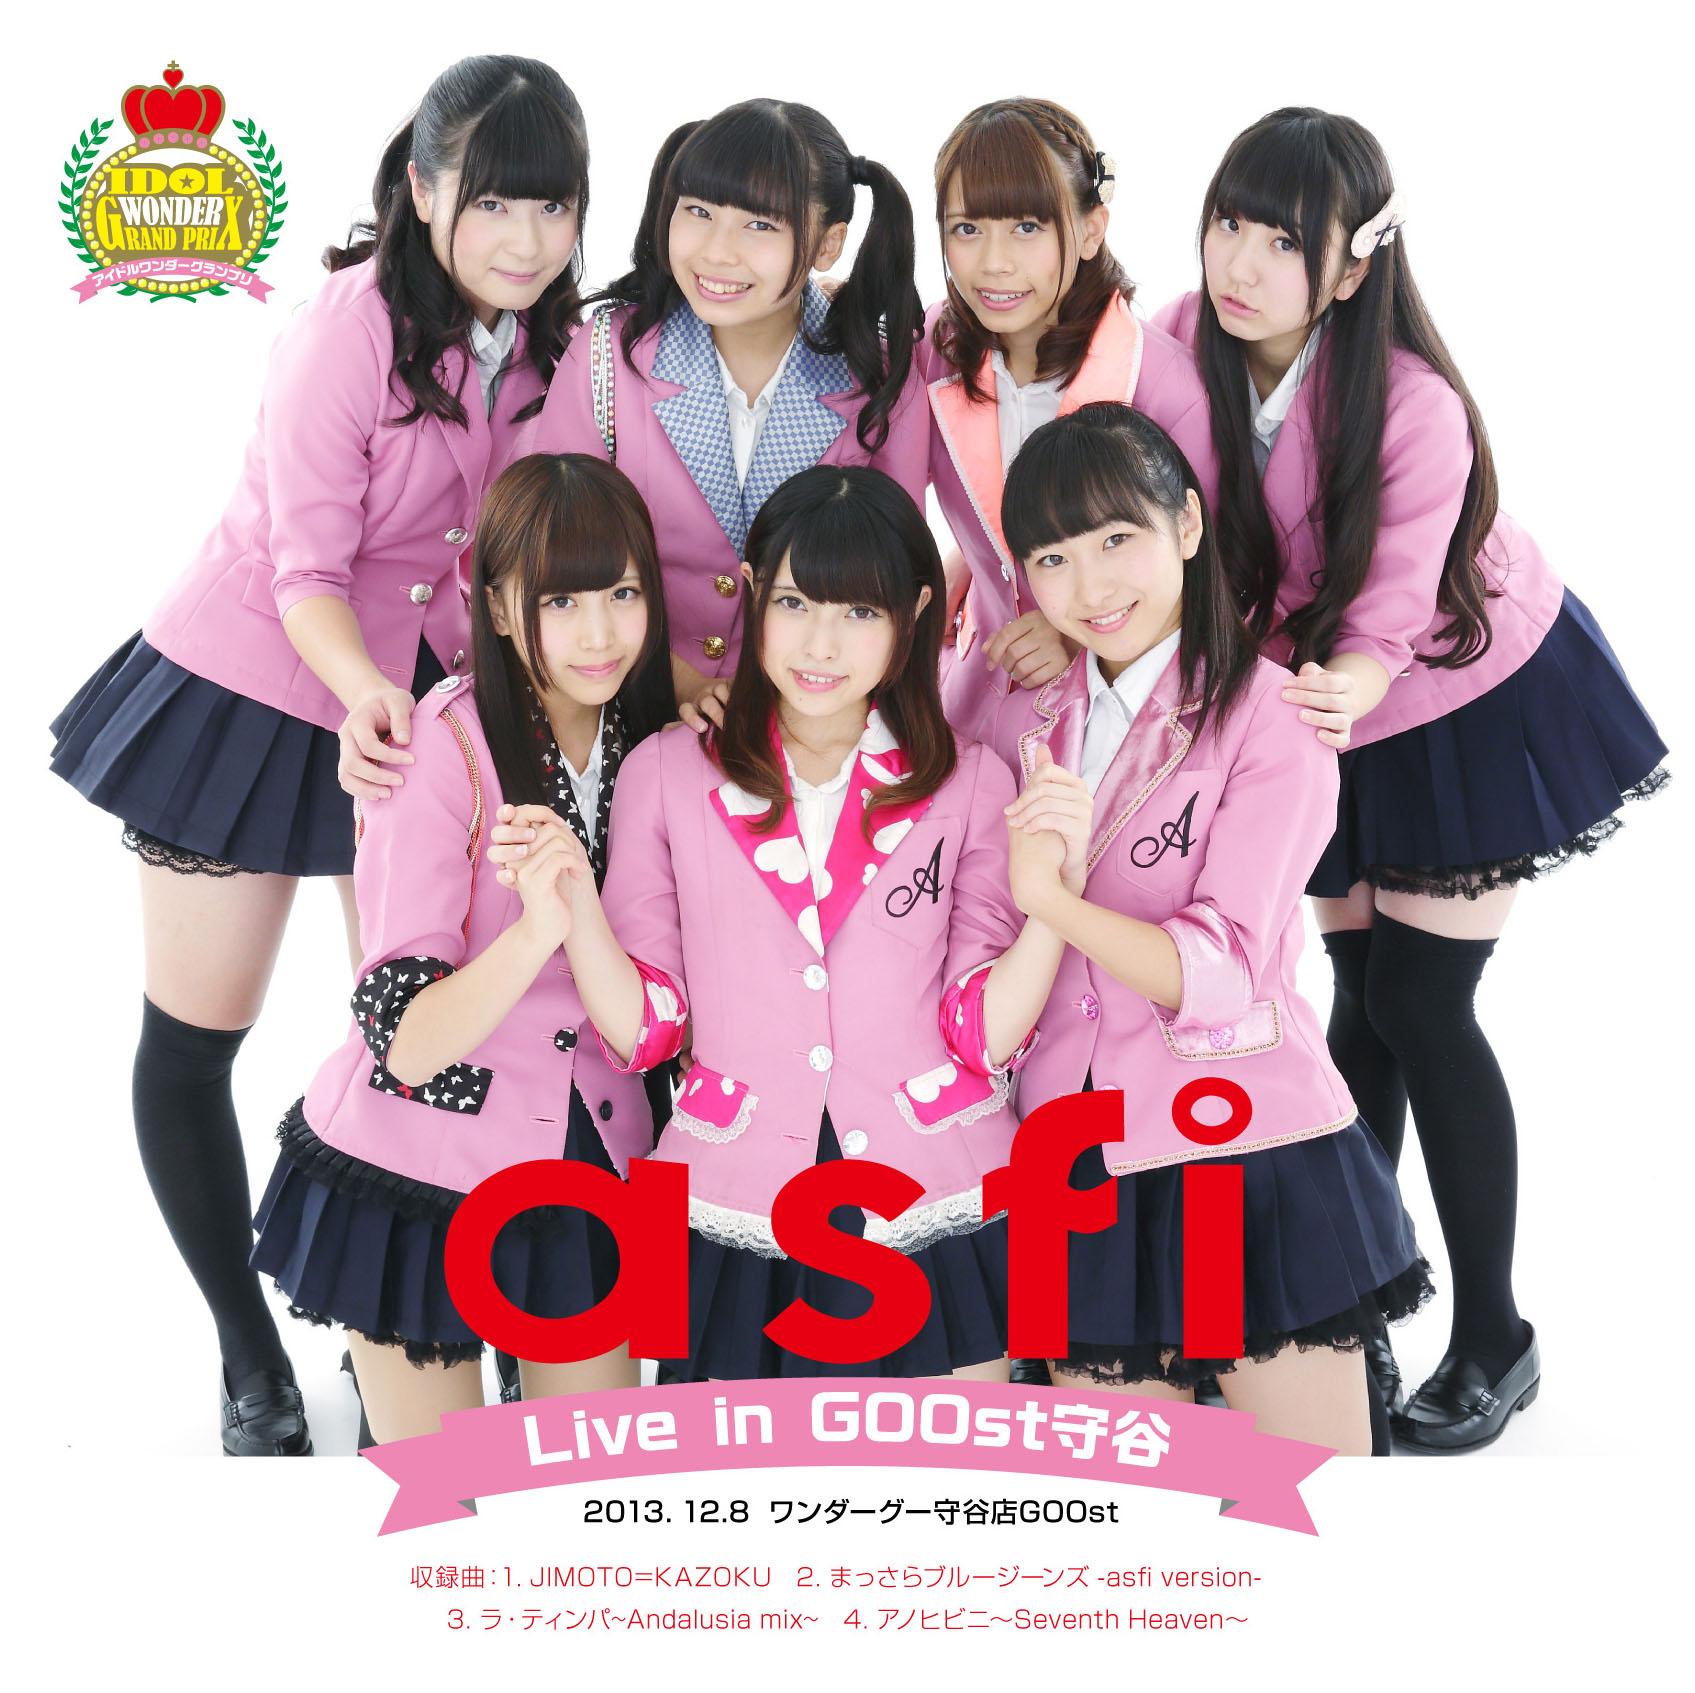 asfi アイドルワンダーグランプリ初代グランプリ記念DVD発売